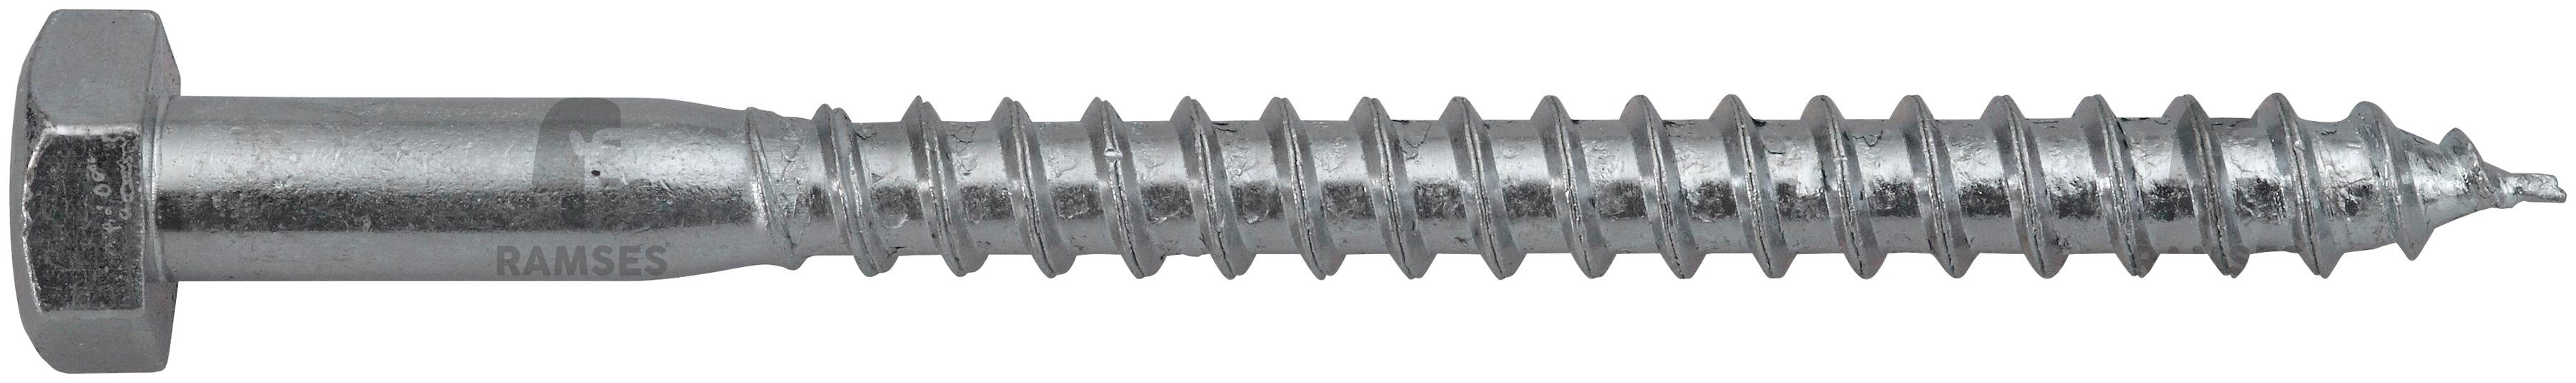 RAMSES Schrauben , Sechskant-Holzschraube 12 x 70 mm 50 Stk.